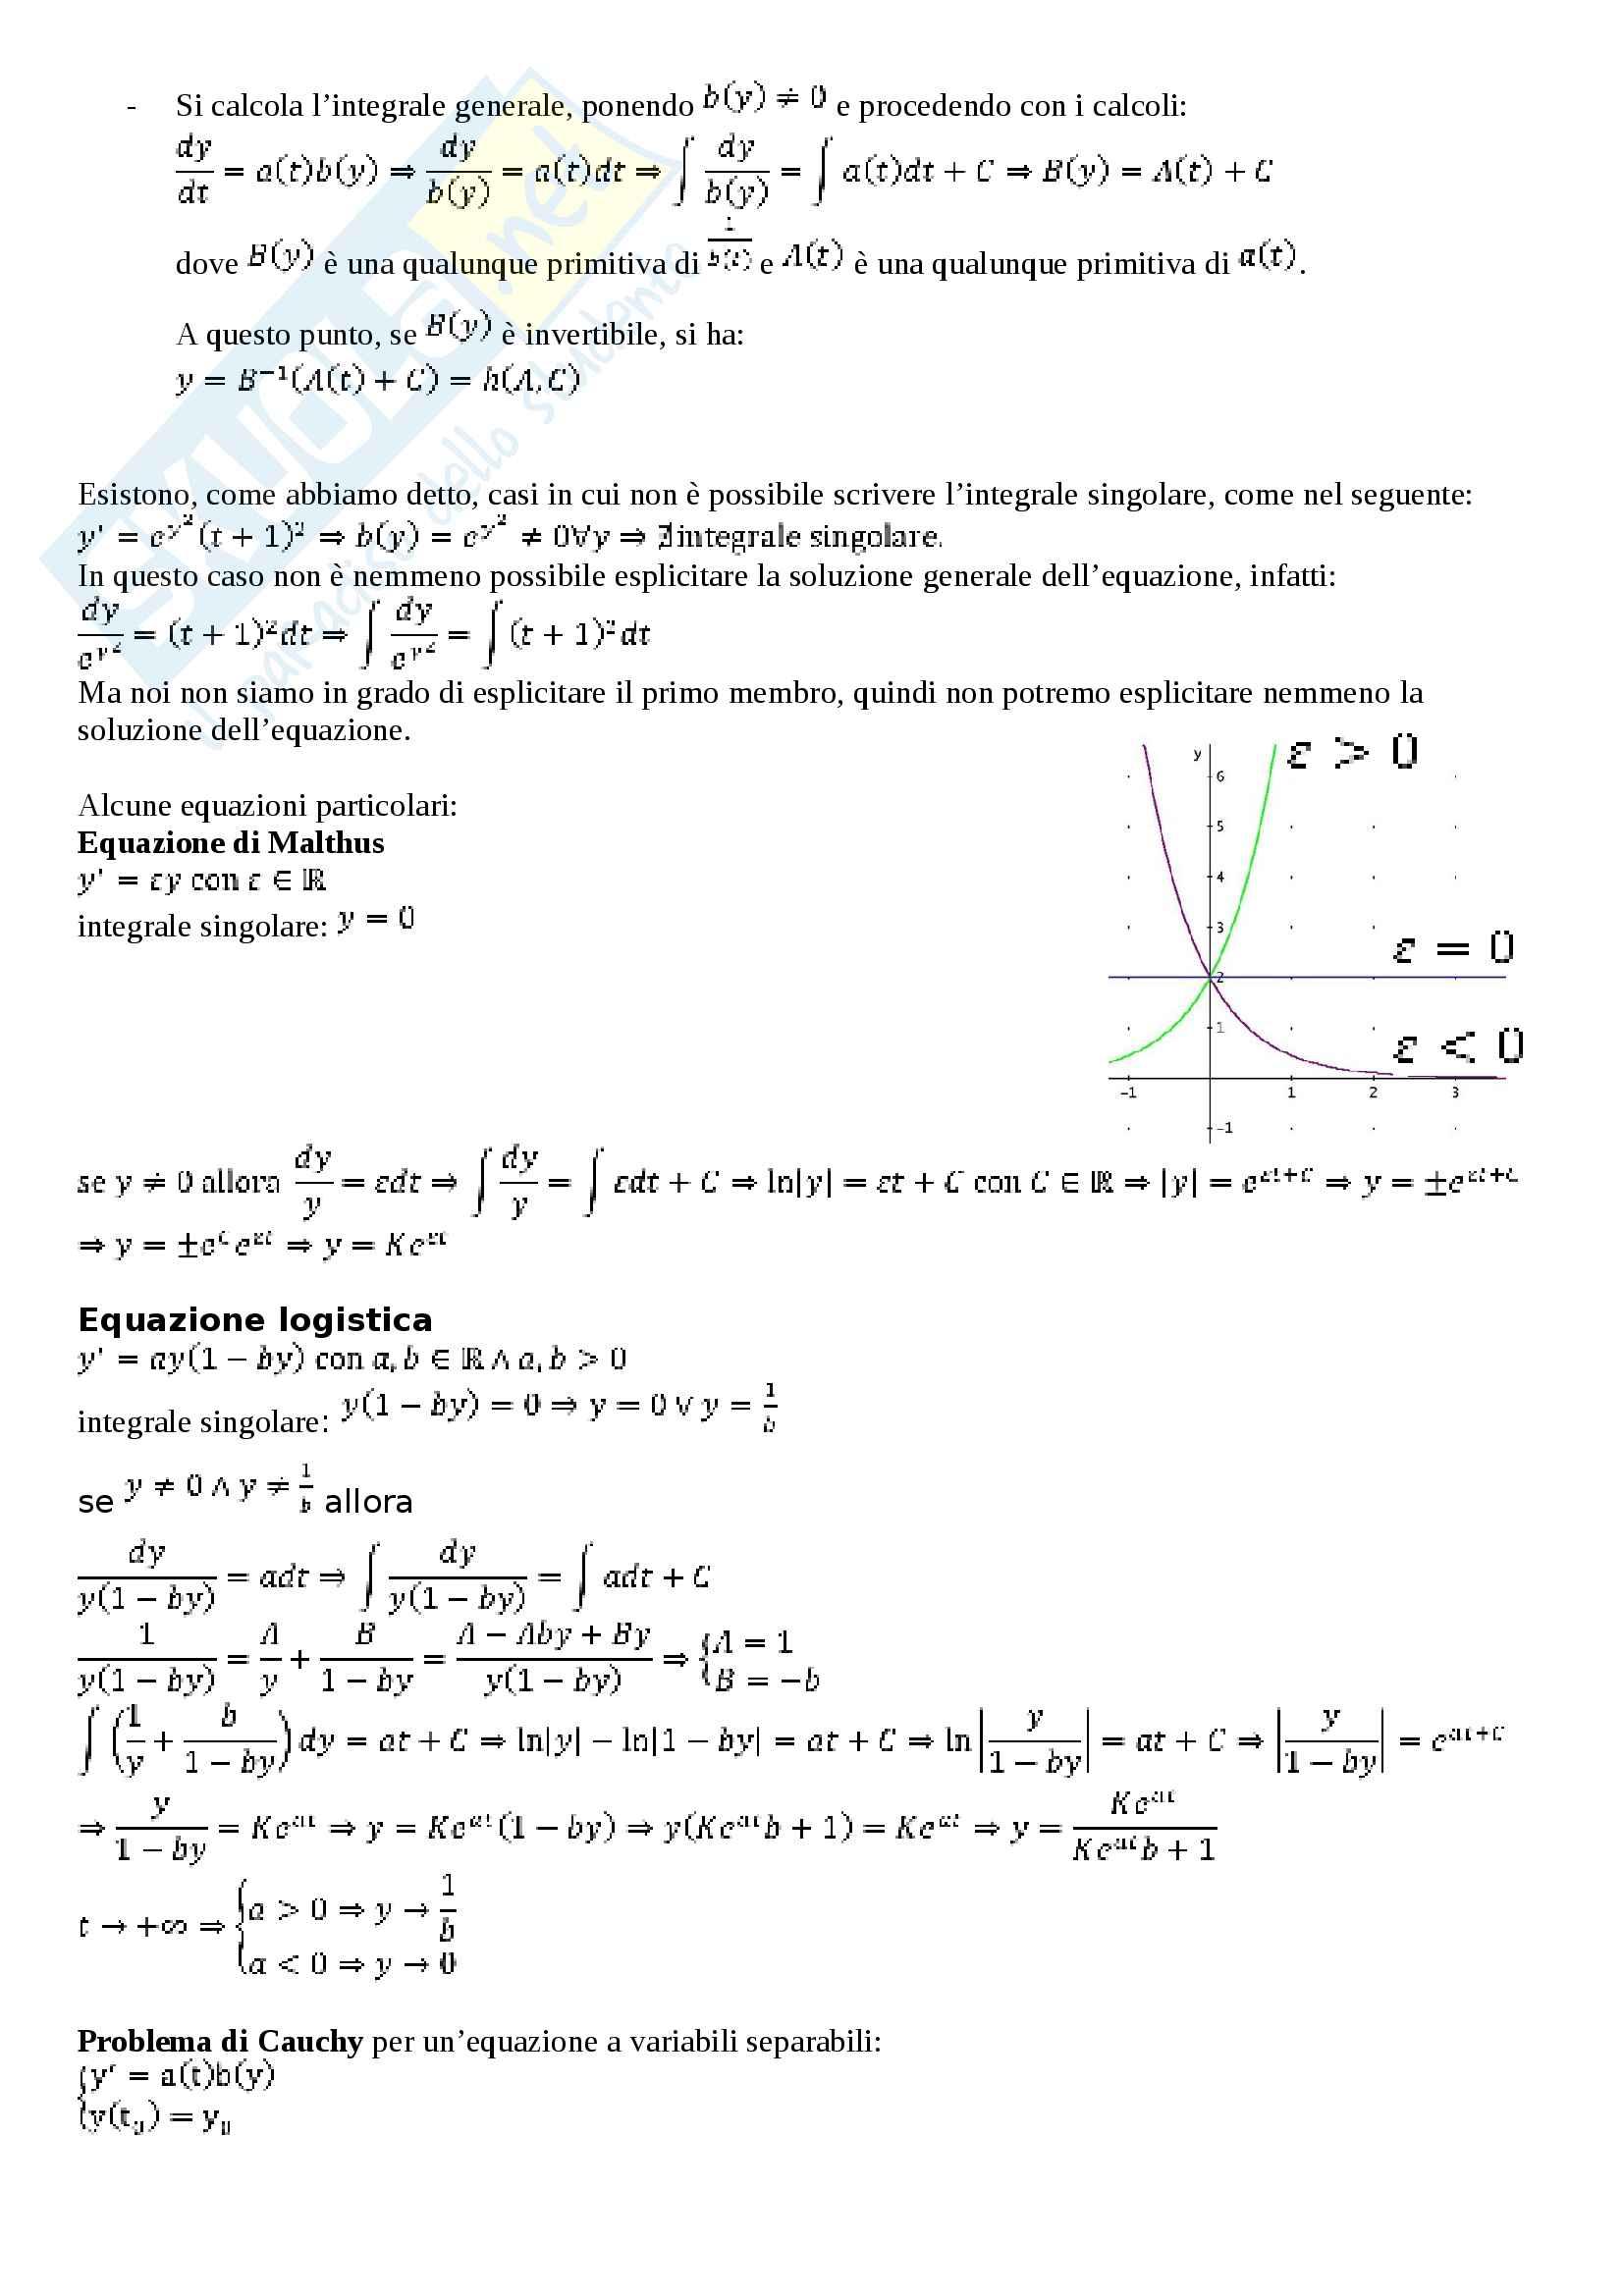 Appunti analisi matematica 2 Pag. 2